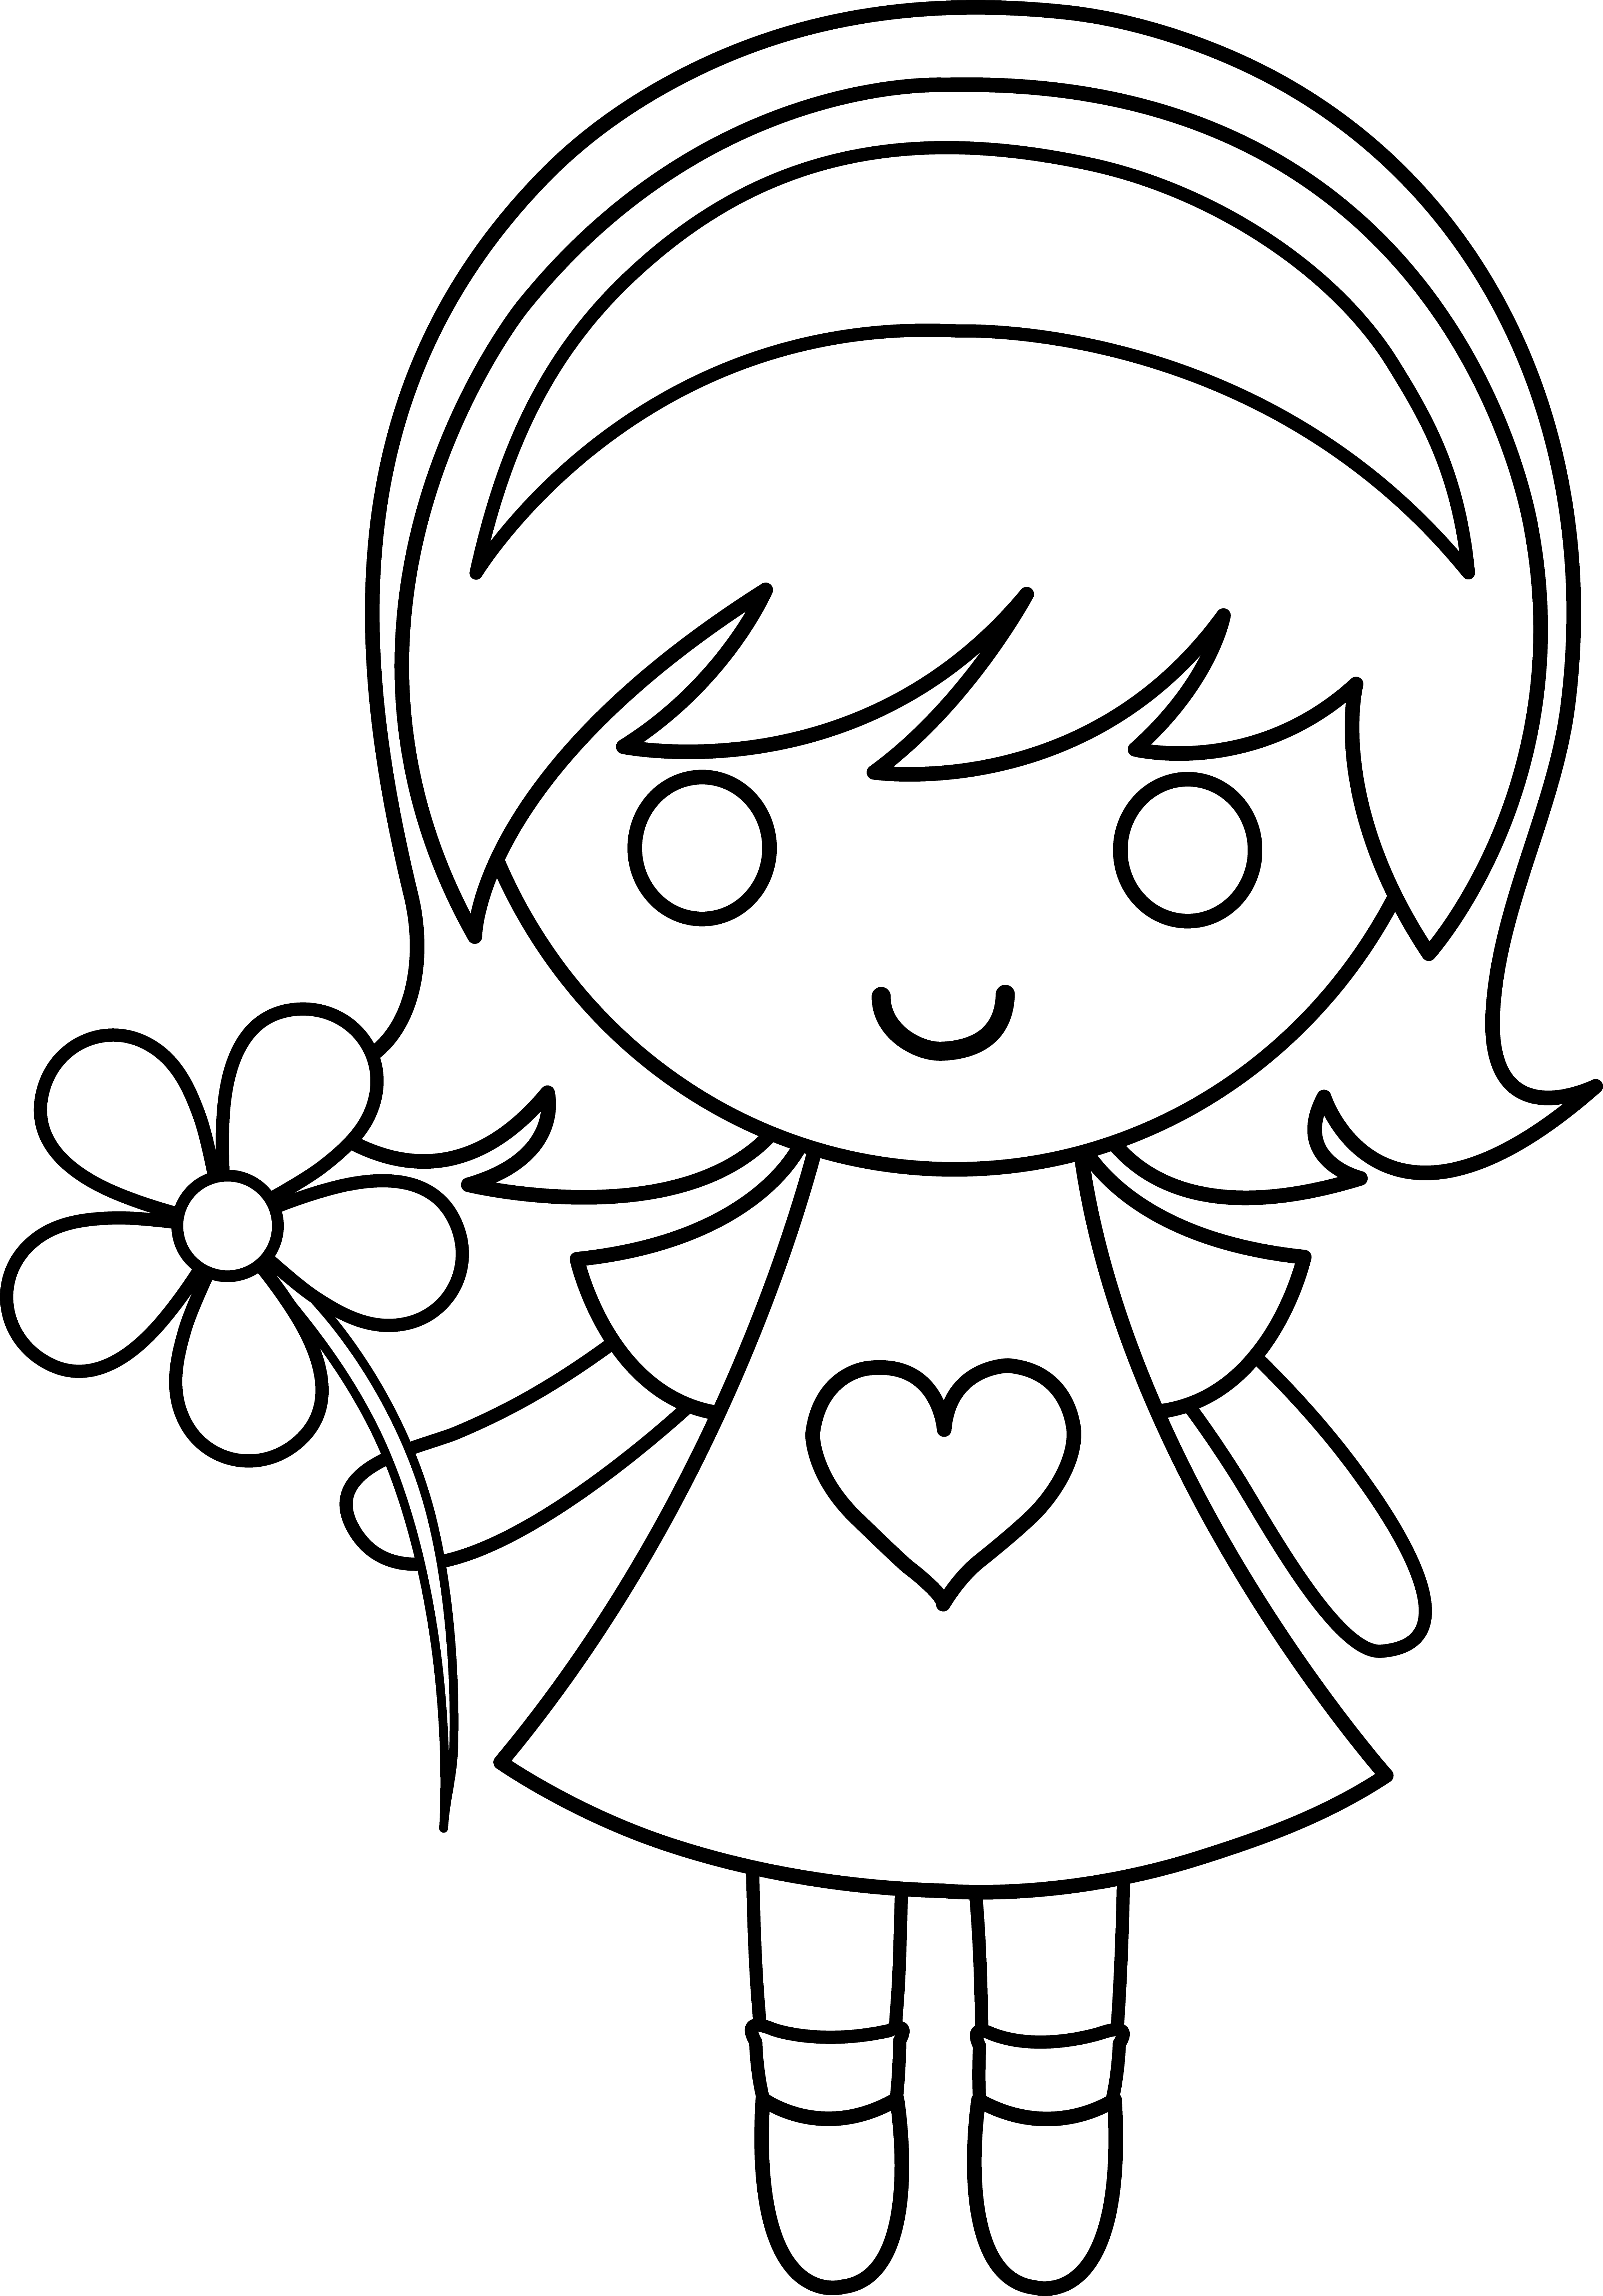 Daisy Girl Colorable Line Art